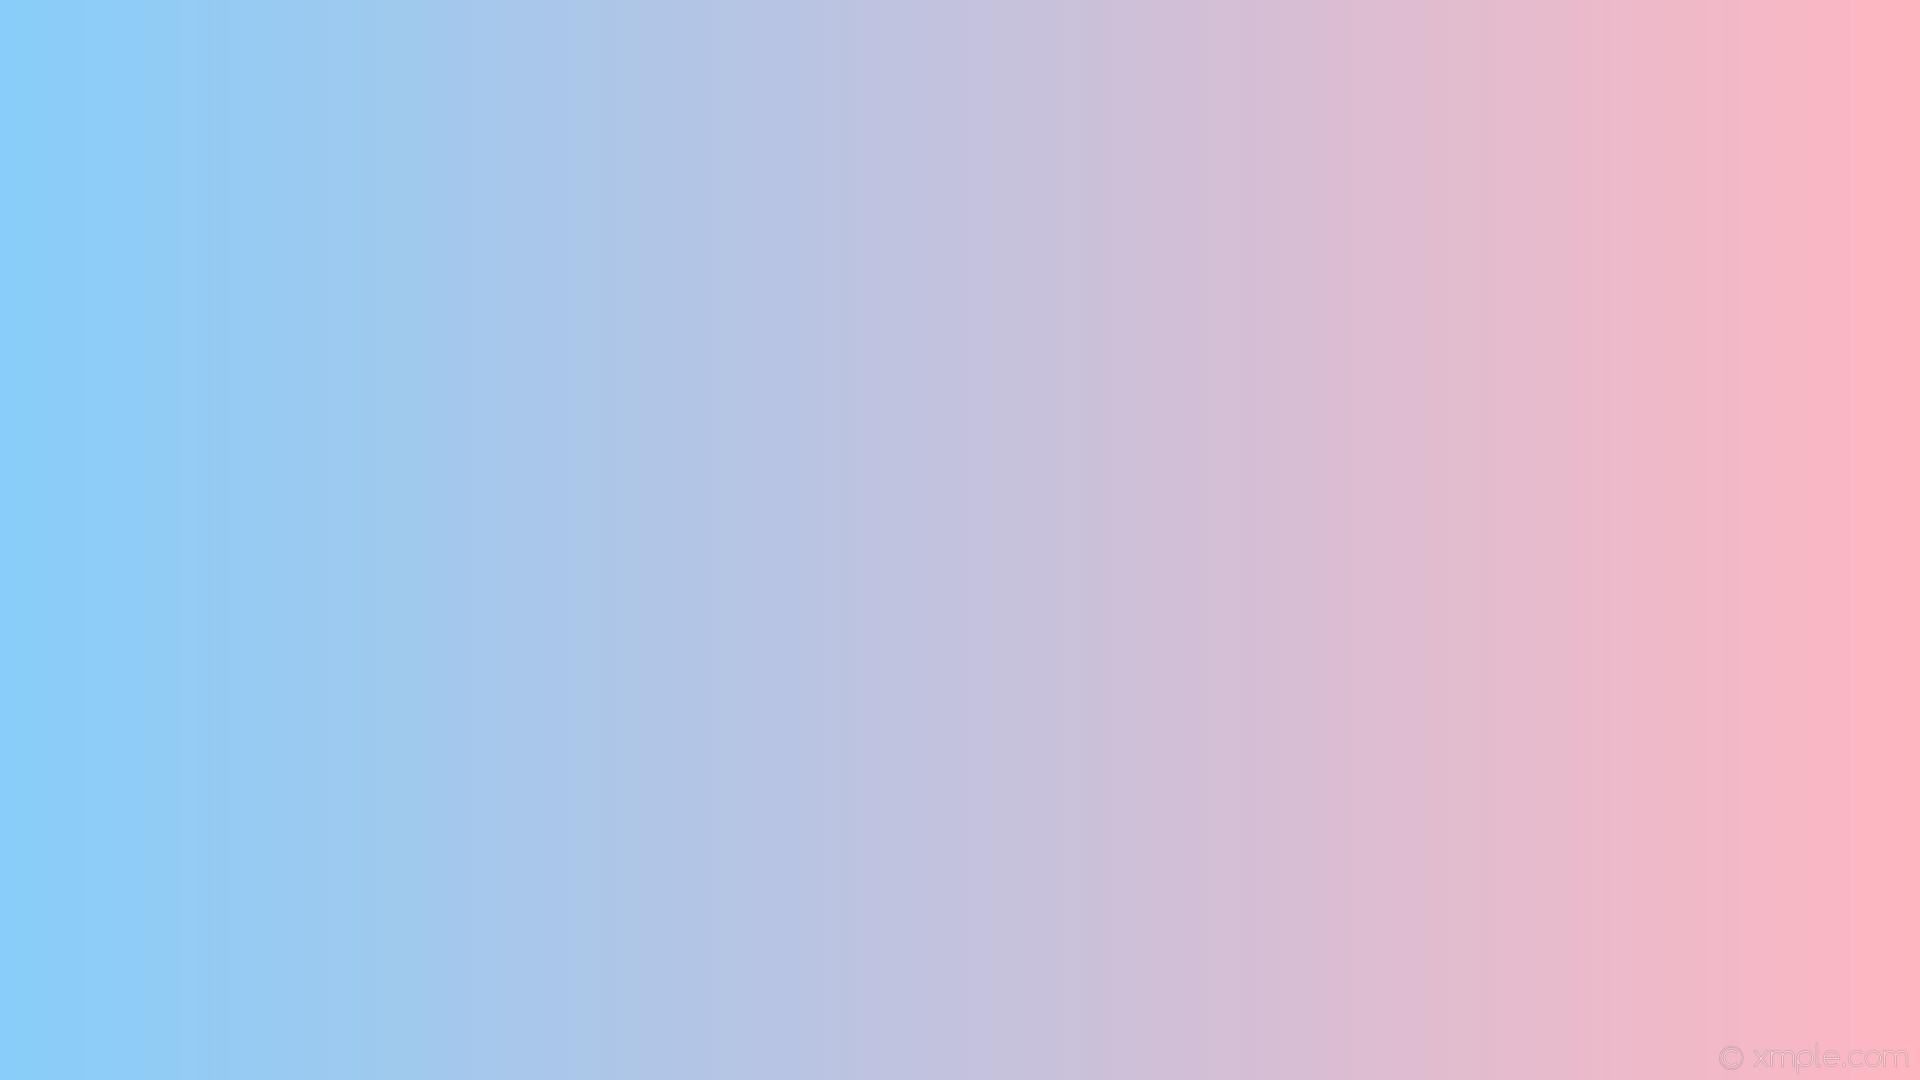 wallpaper blue pink gradient linear light pink light sky blue #ffb6c1  #87cefa 0°